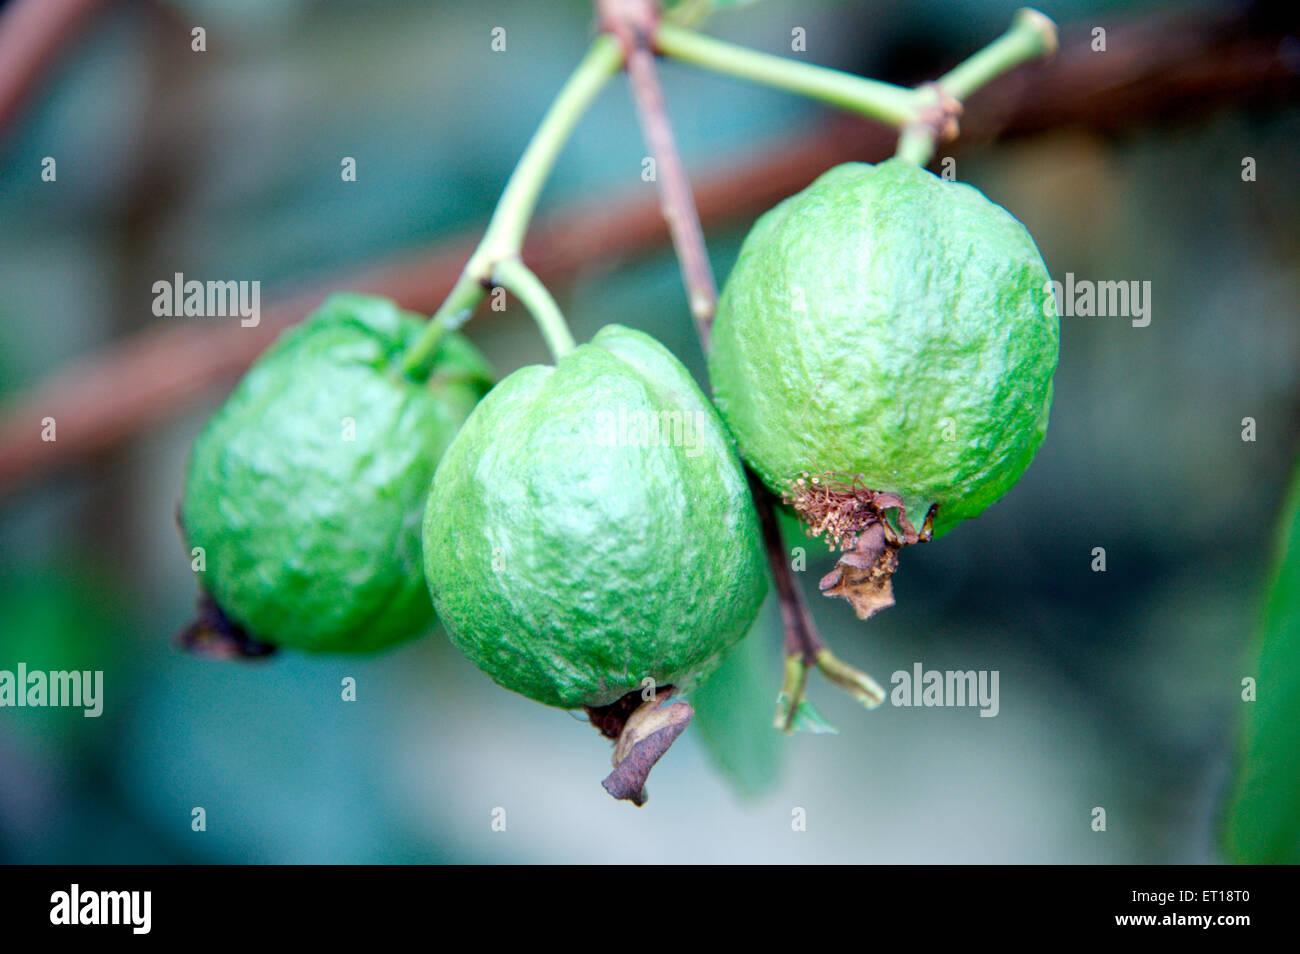 Guava Fruit on Plant Stock Photo: 83622112 - Alamy